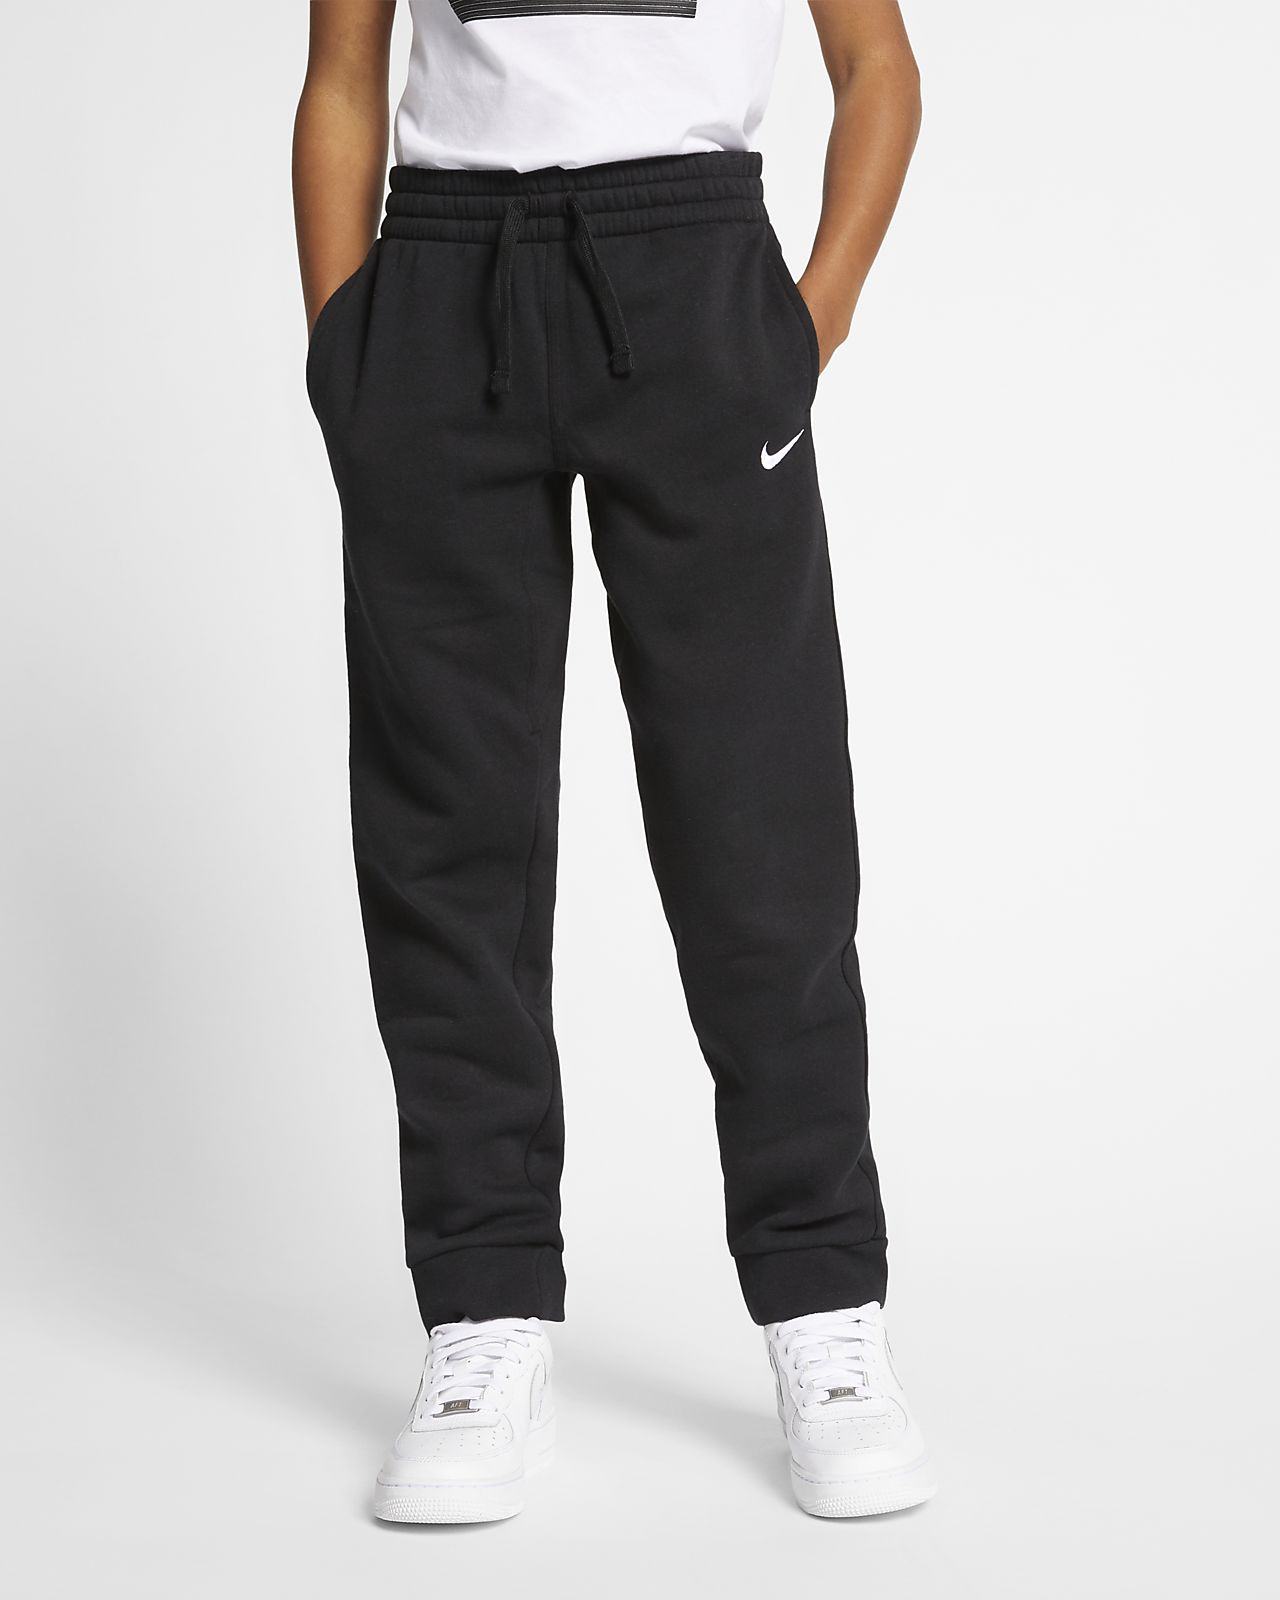 Nike-bukser til store børn